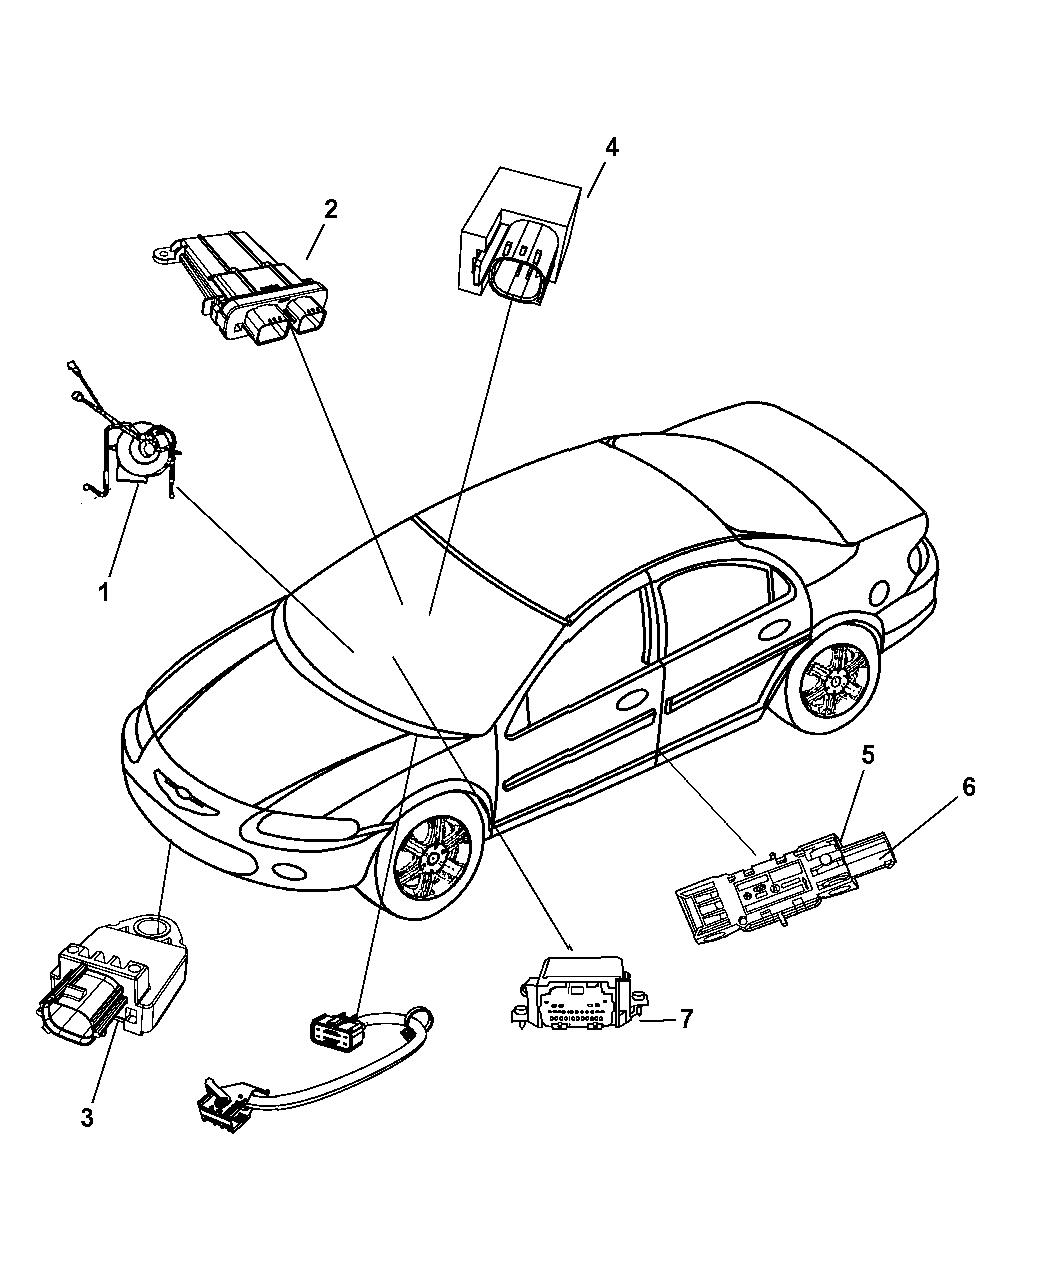 2010 Dodge Avenger Air Bag Modules Impact Sensor & Clock